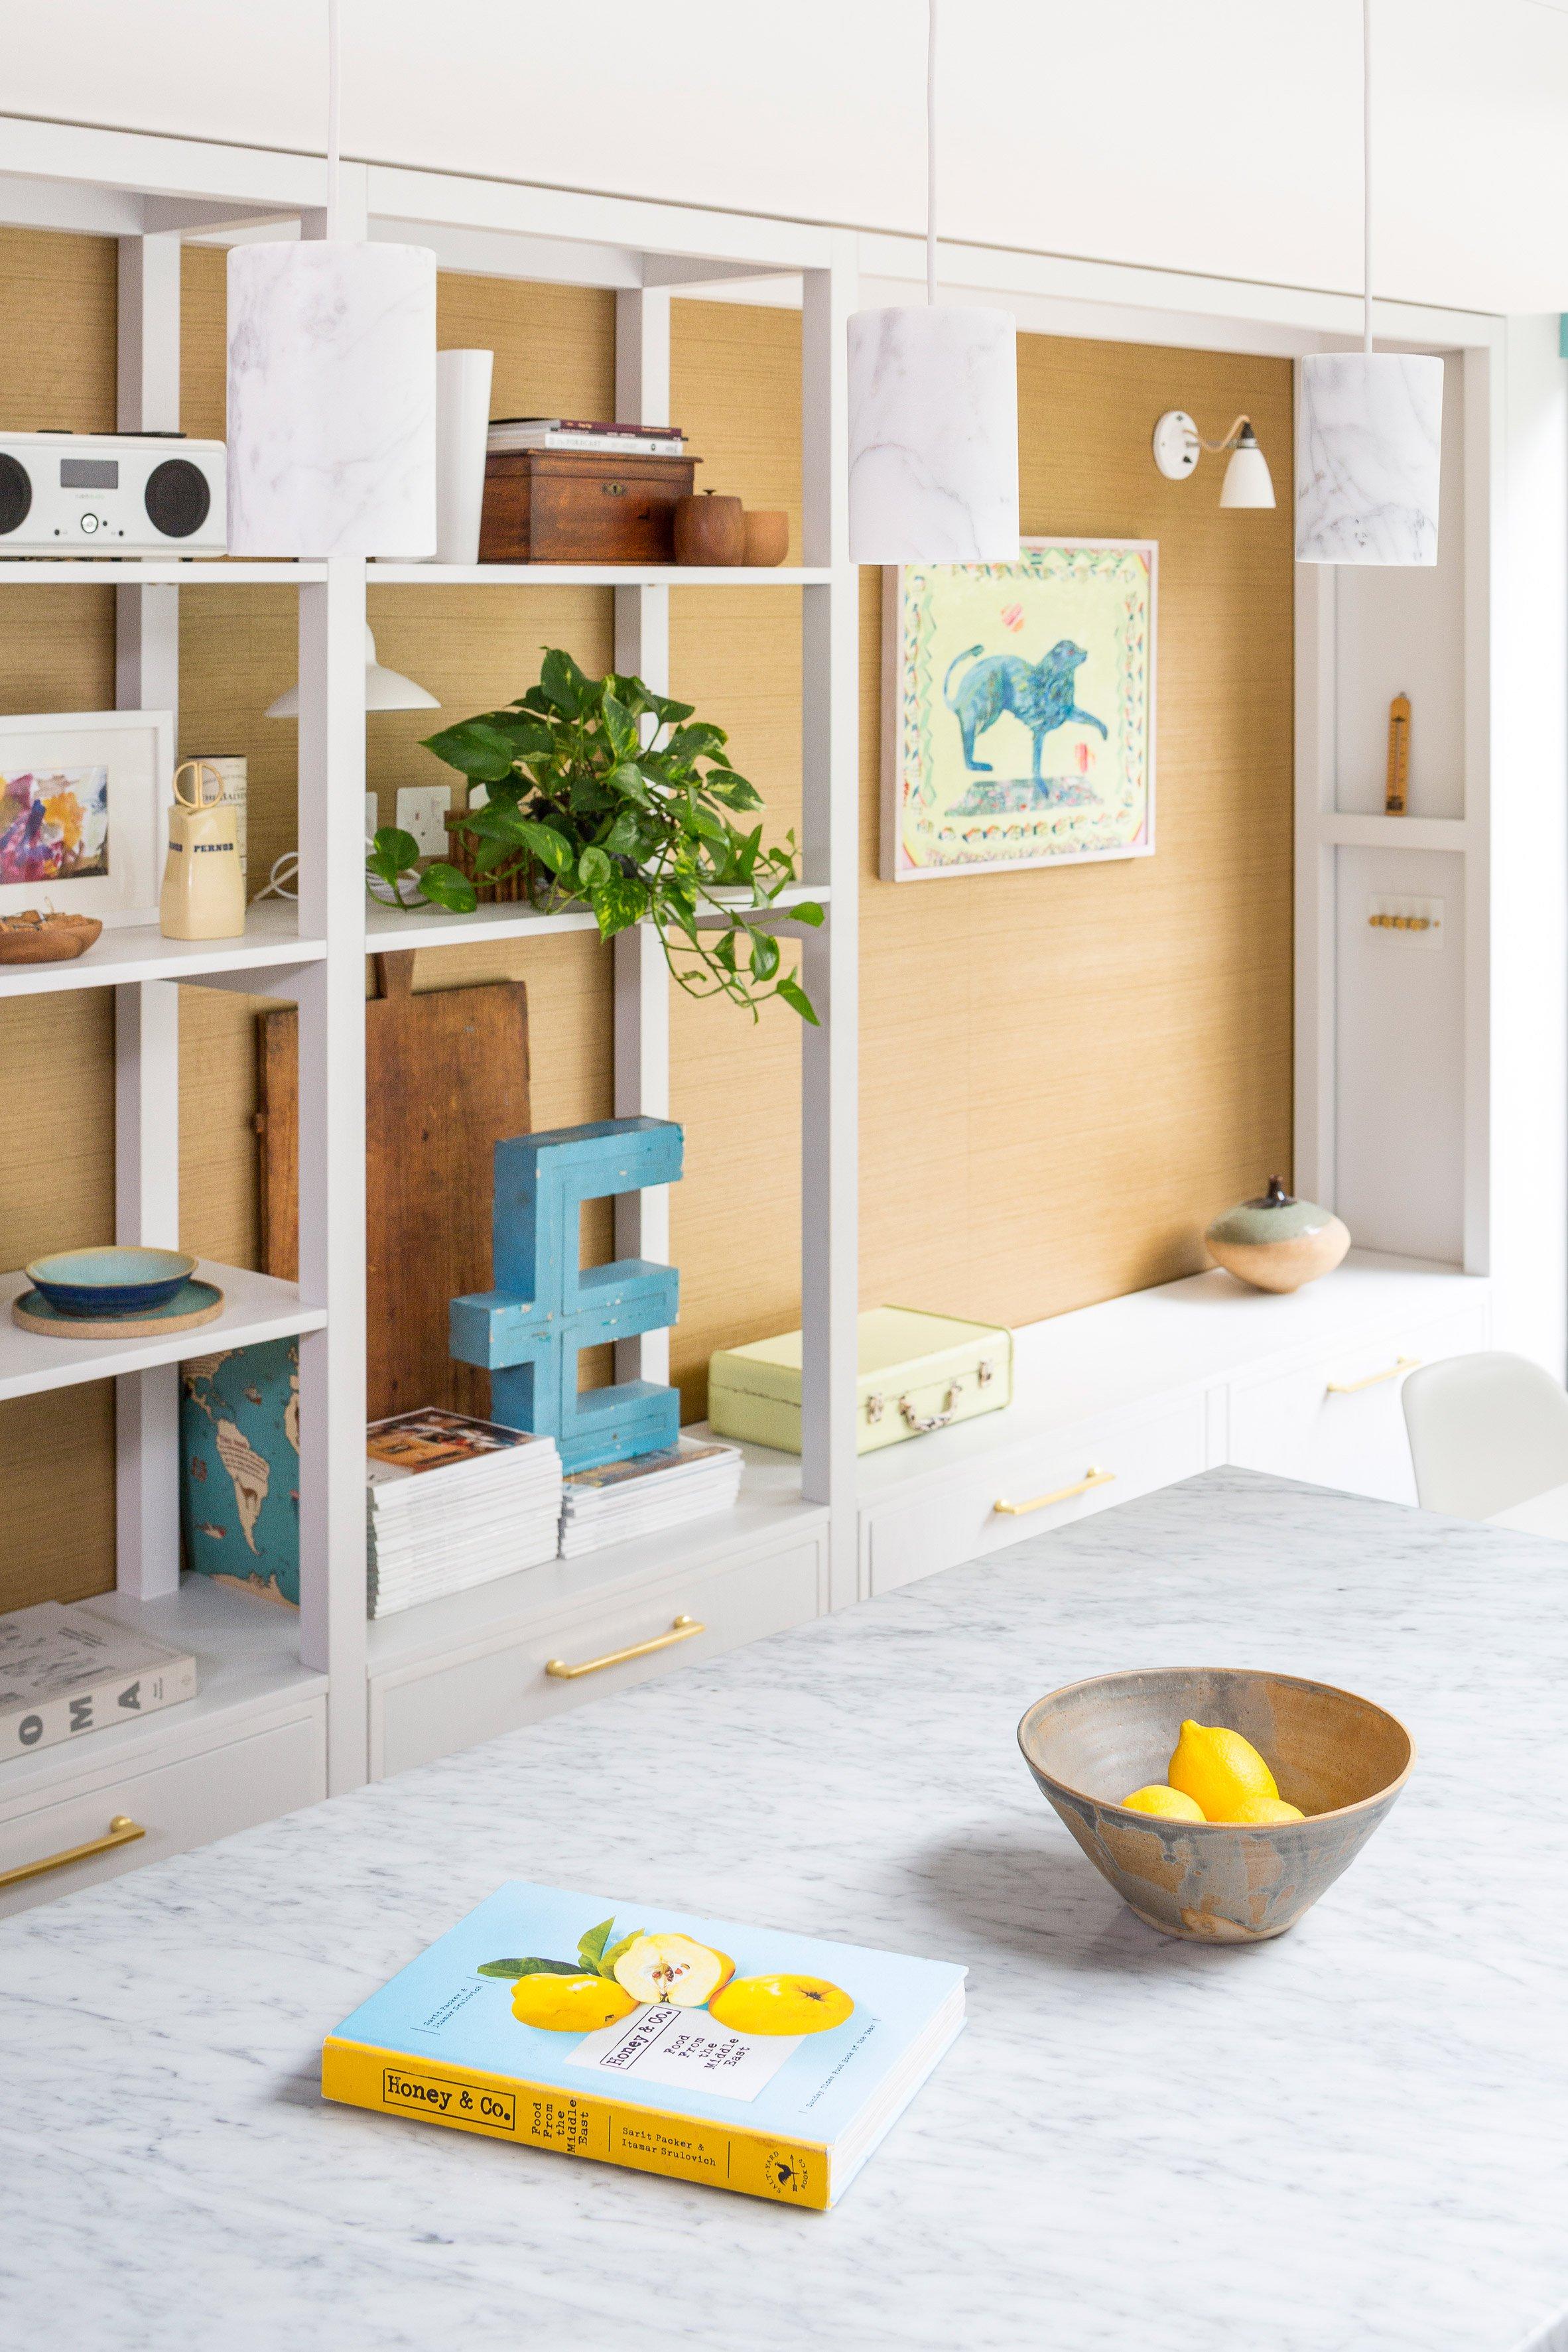 Marble, brass, and herringbone floors make this London renovation shine